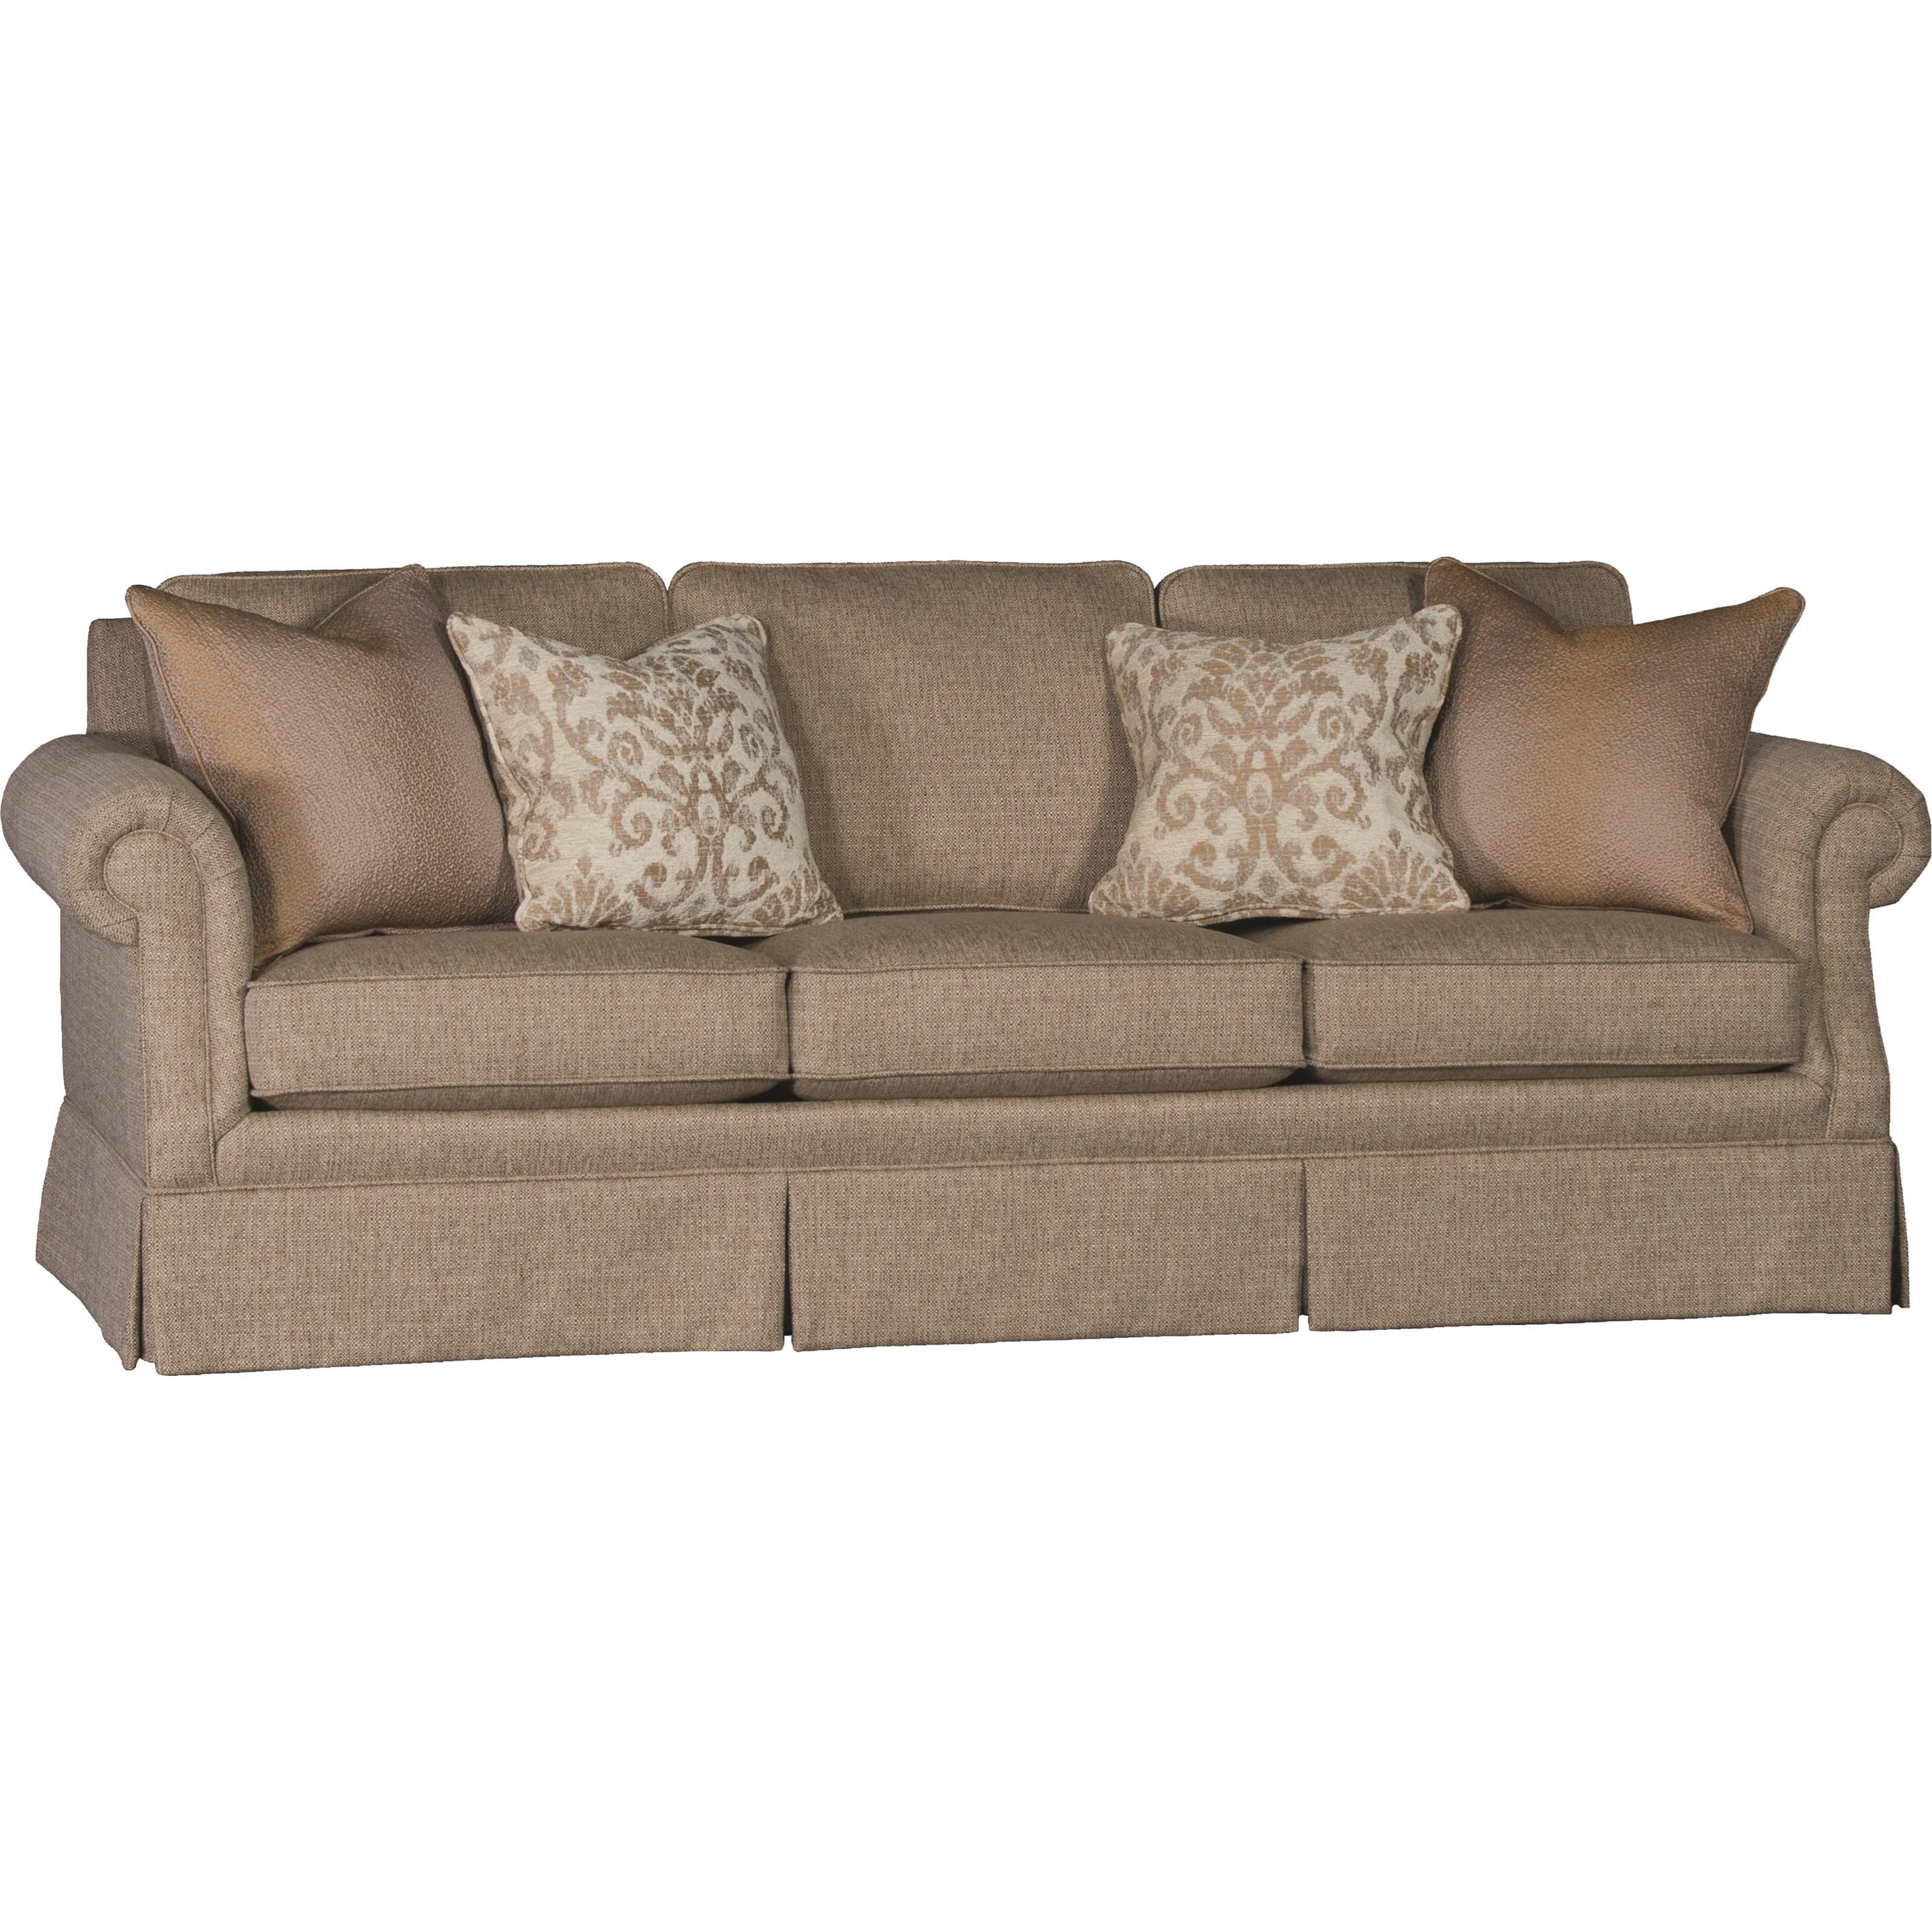 2600 Sofa by Mayo at Wilson's Furniture